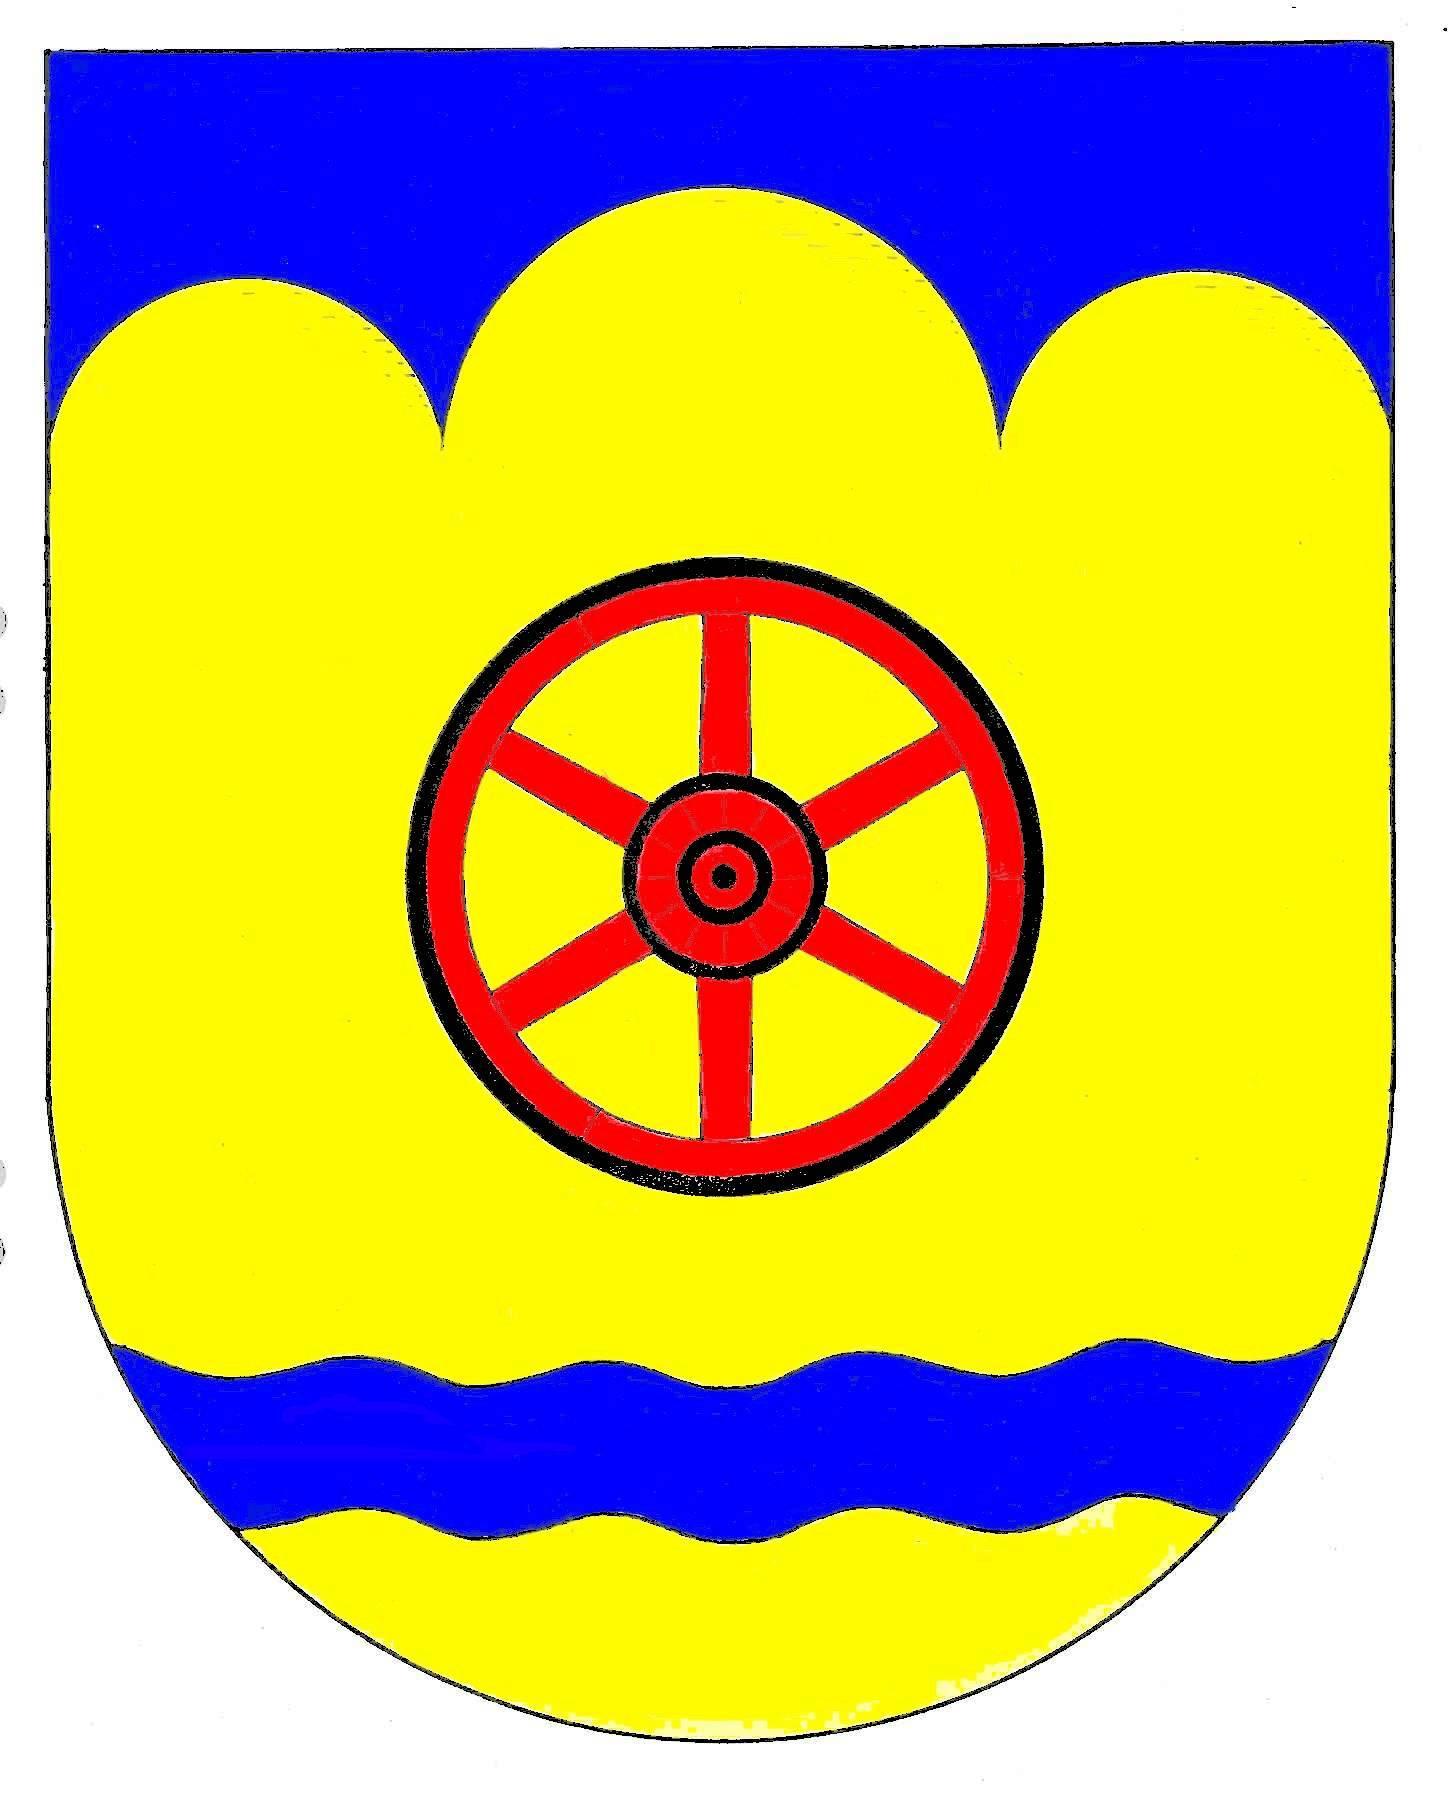 Wappen GemeindeEnge-Sande, Kreis Nordfriesland